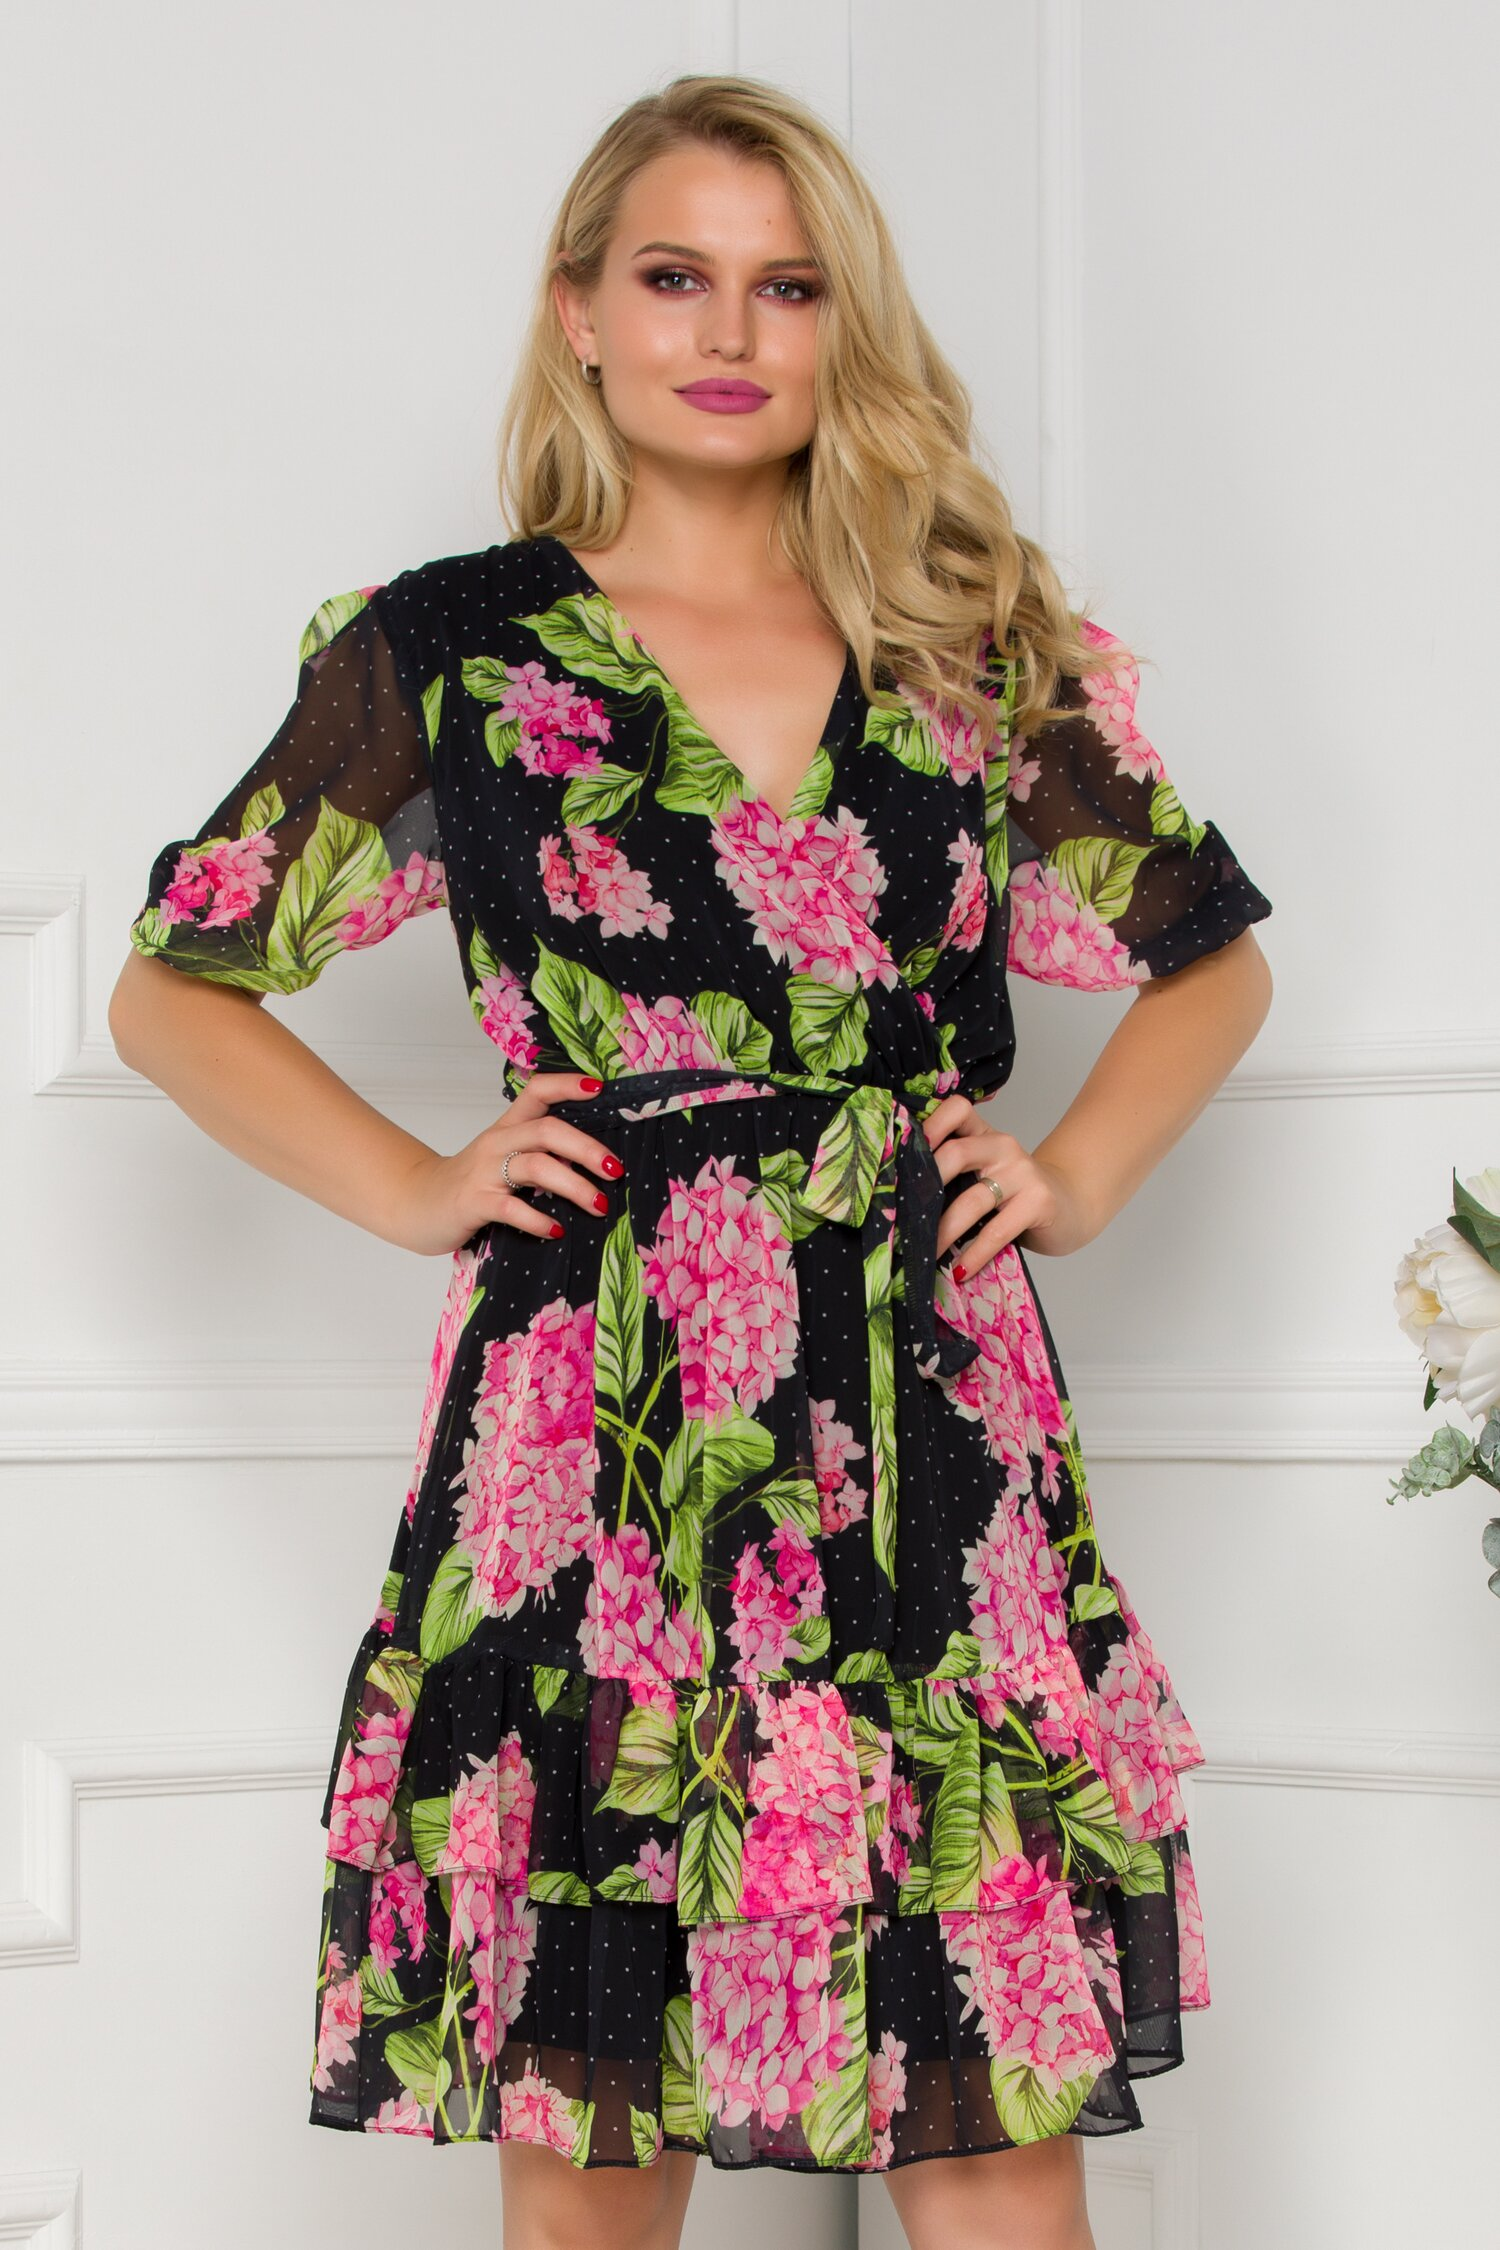 Rochie Anisia neagra cu imprimeuri florale roz